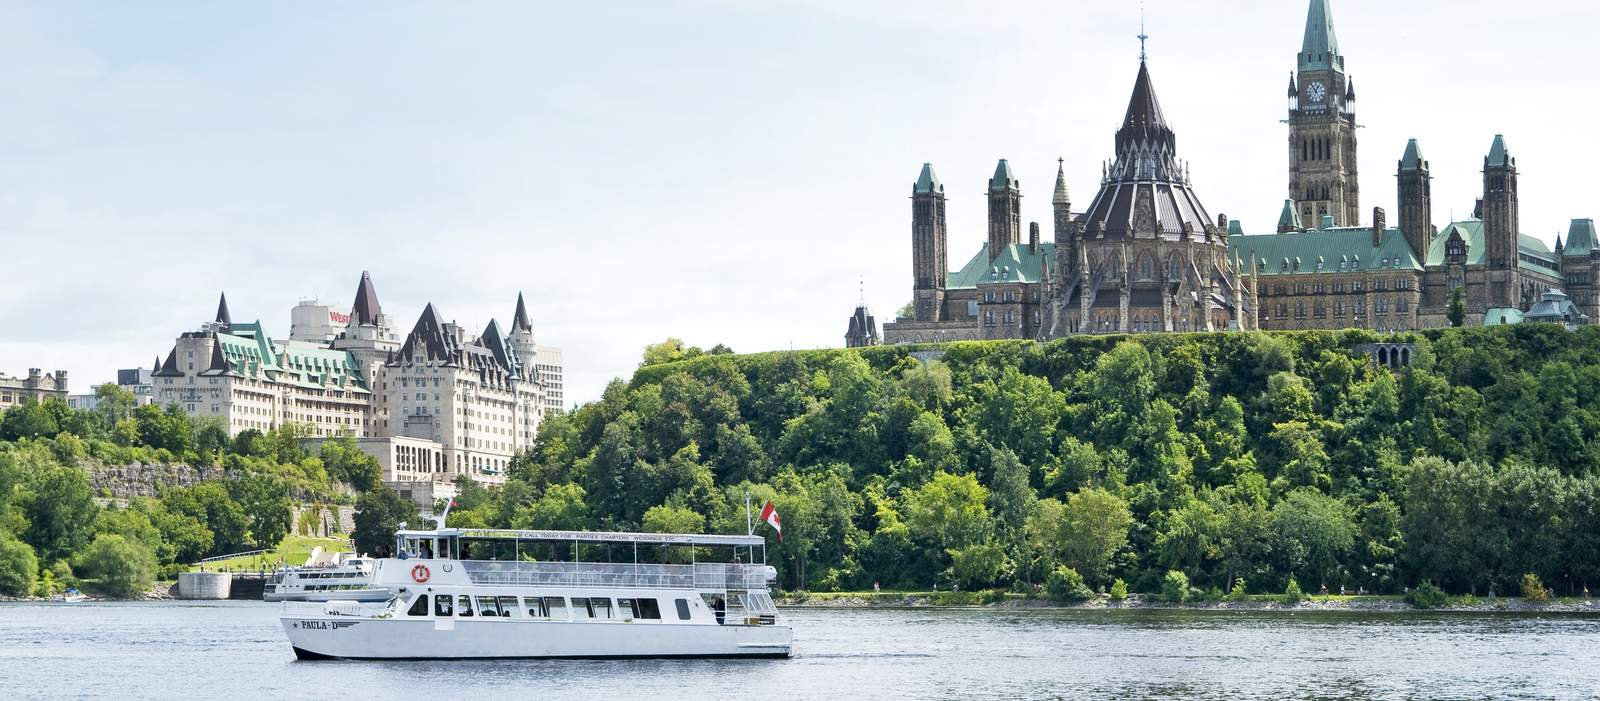 Ottawa River Boat Tour beim Parliament Hill in Ottawa, Ontario